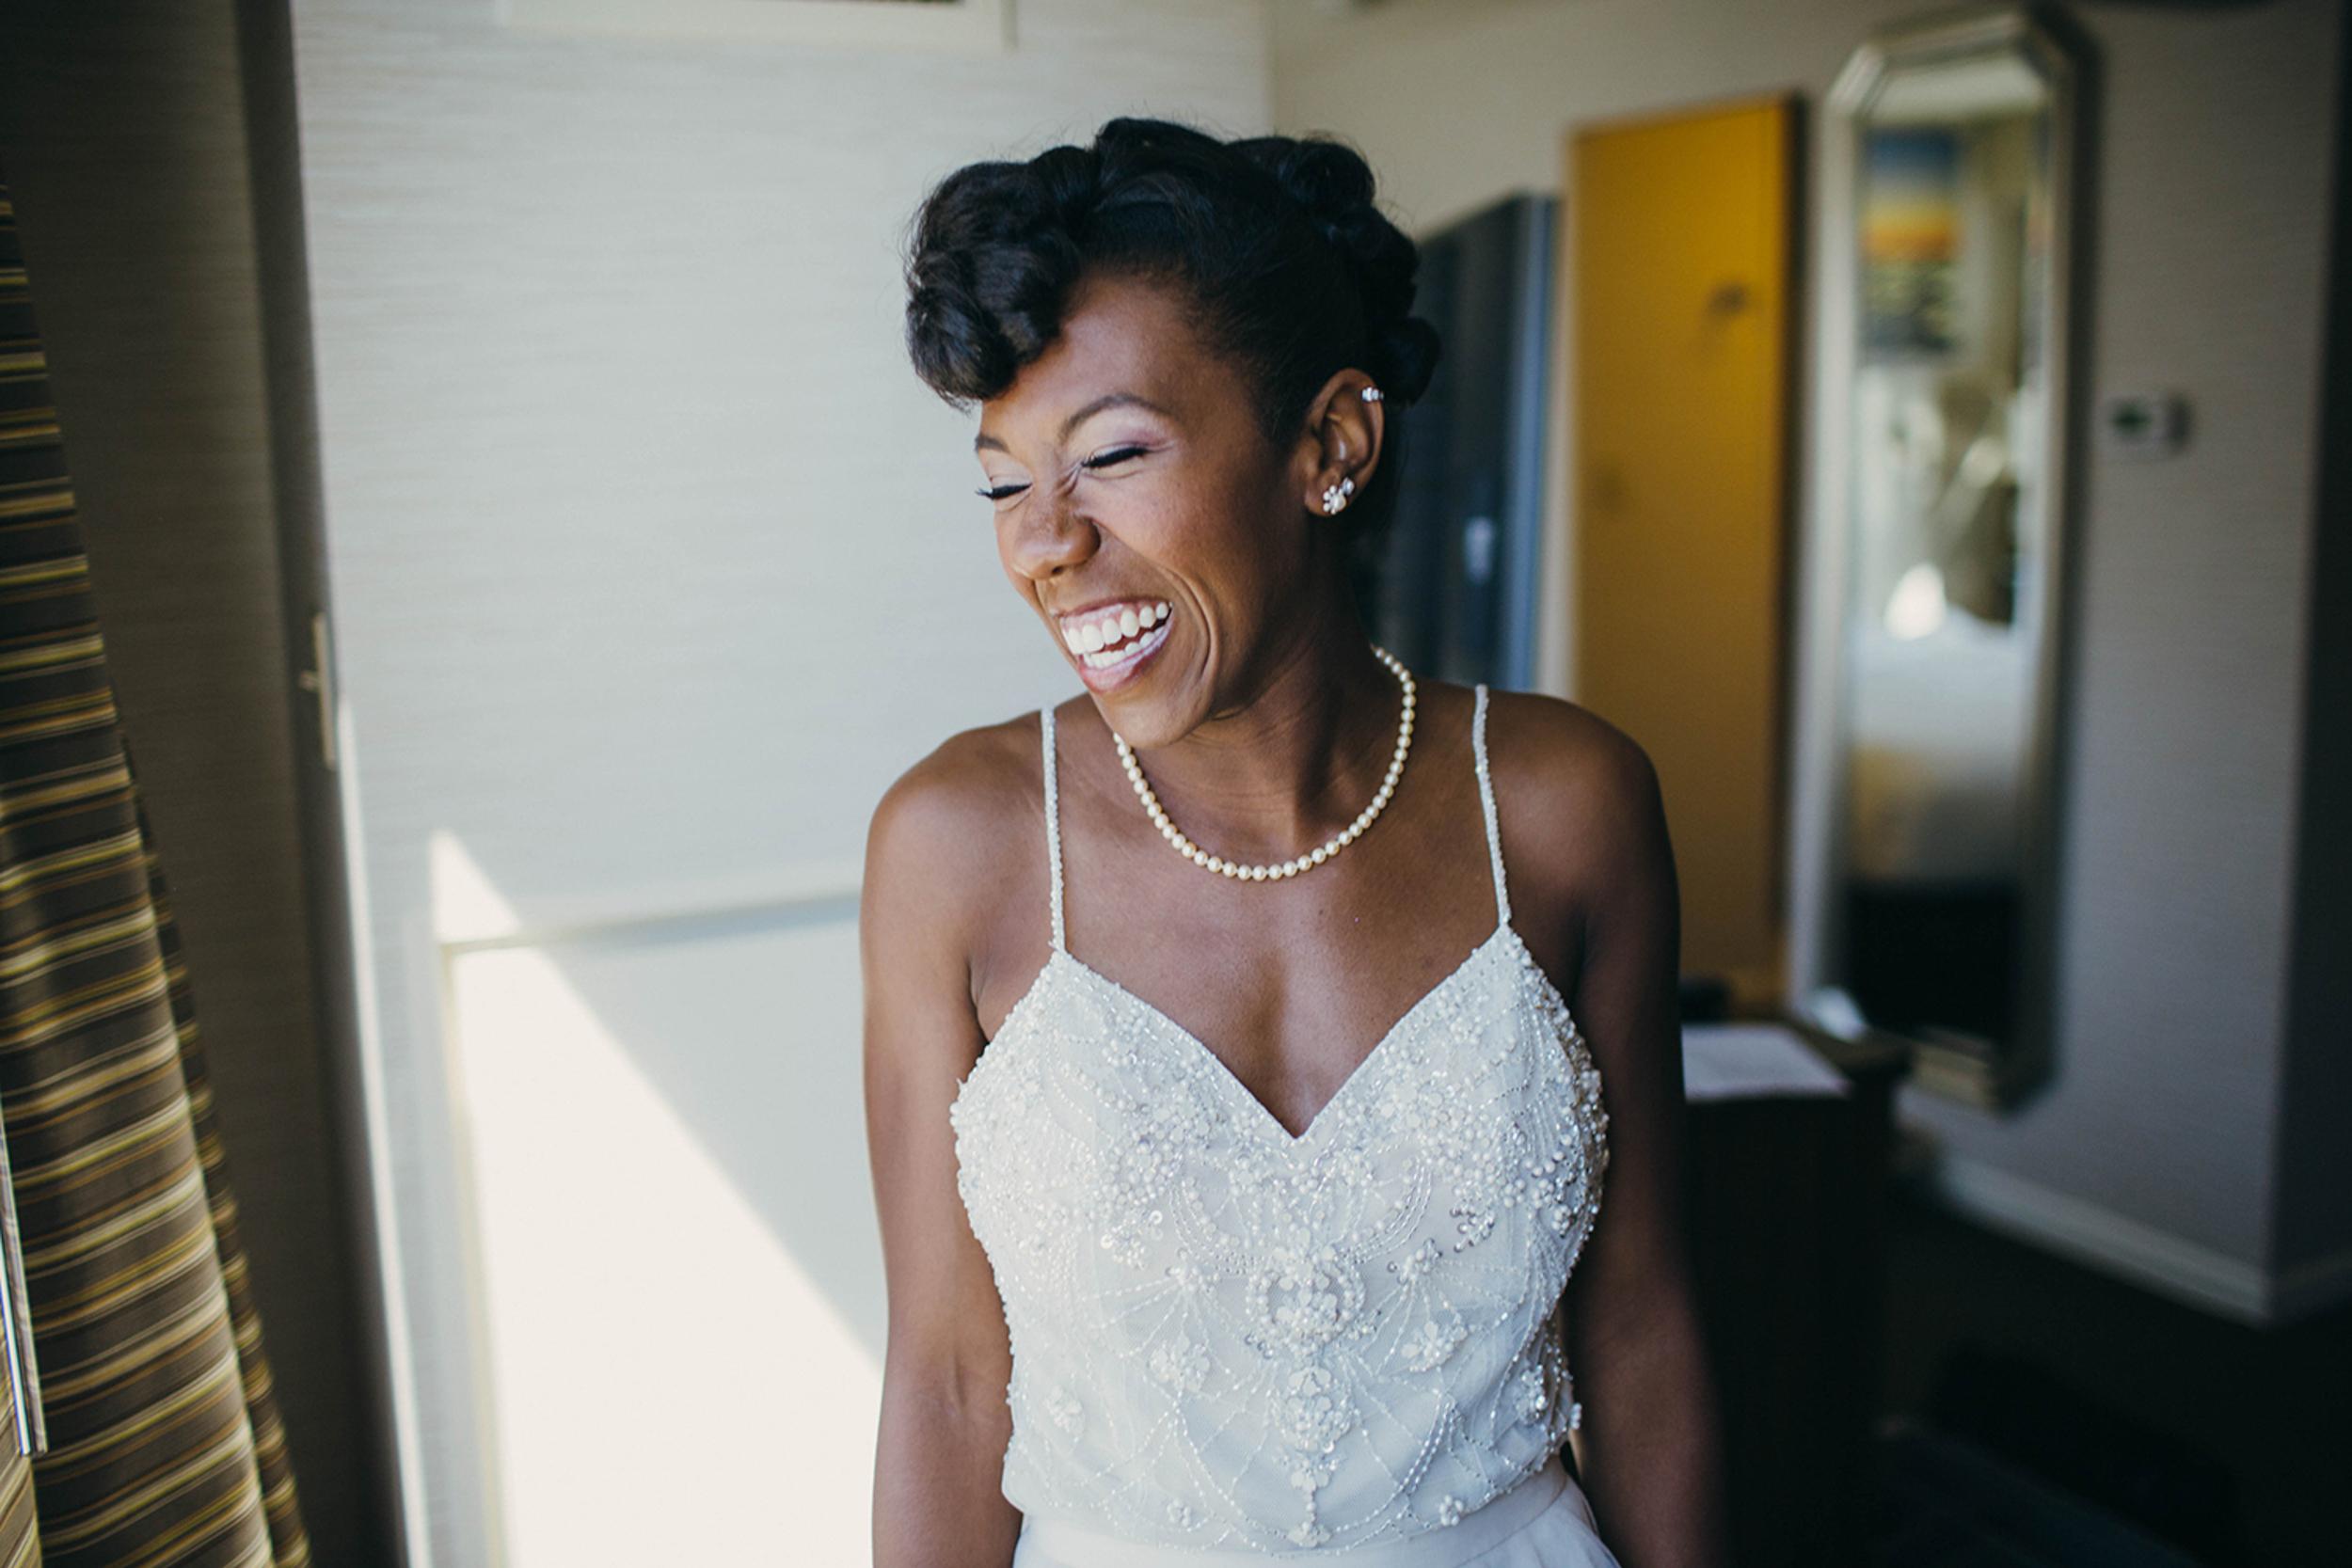 chicago.wedding.urban.intimate.zed451.lake.milton olive park-15.jpg